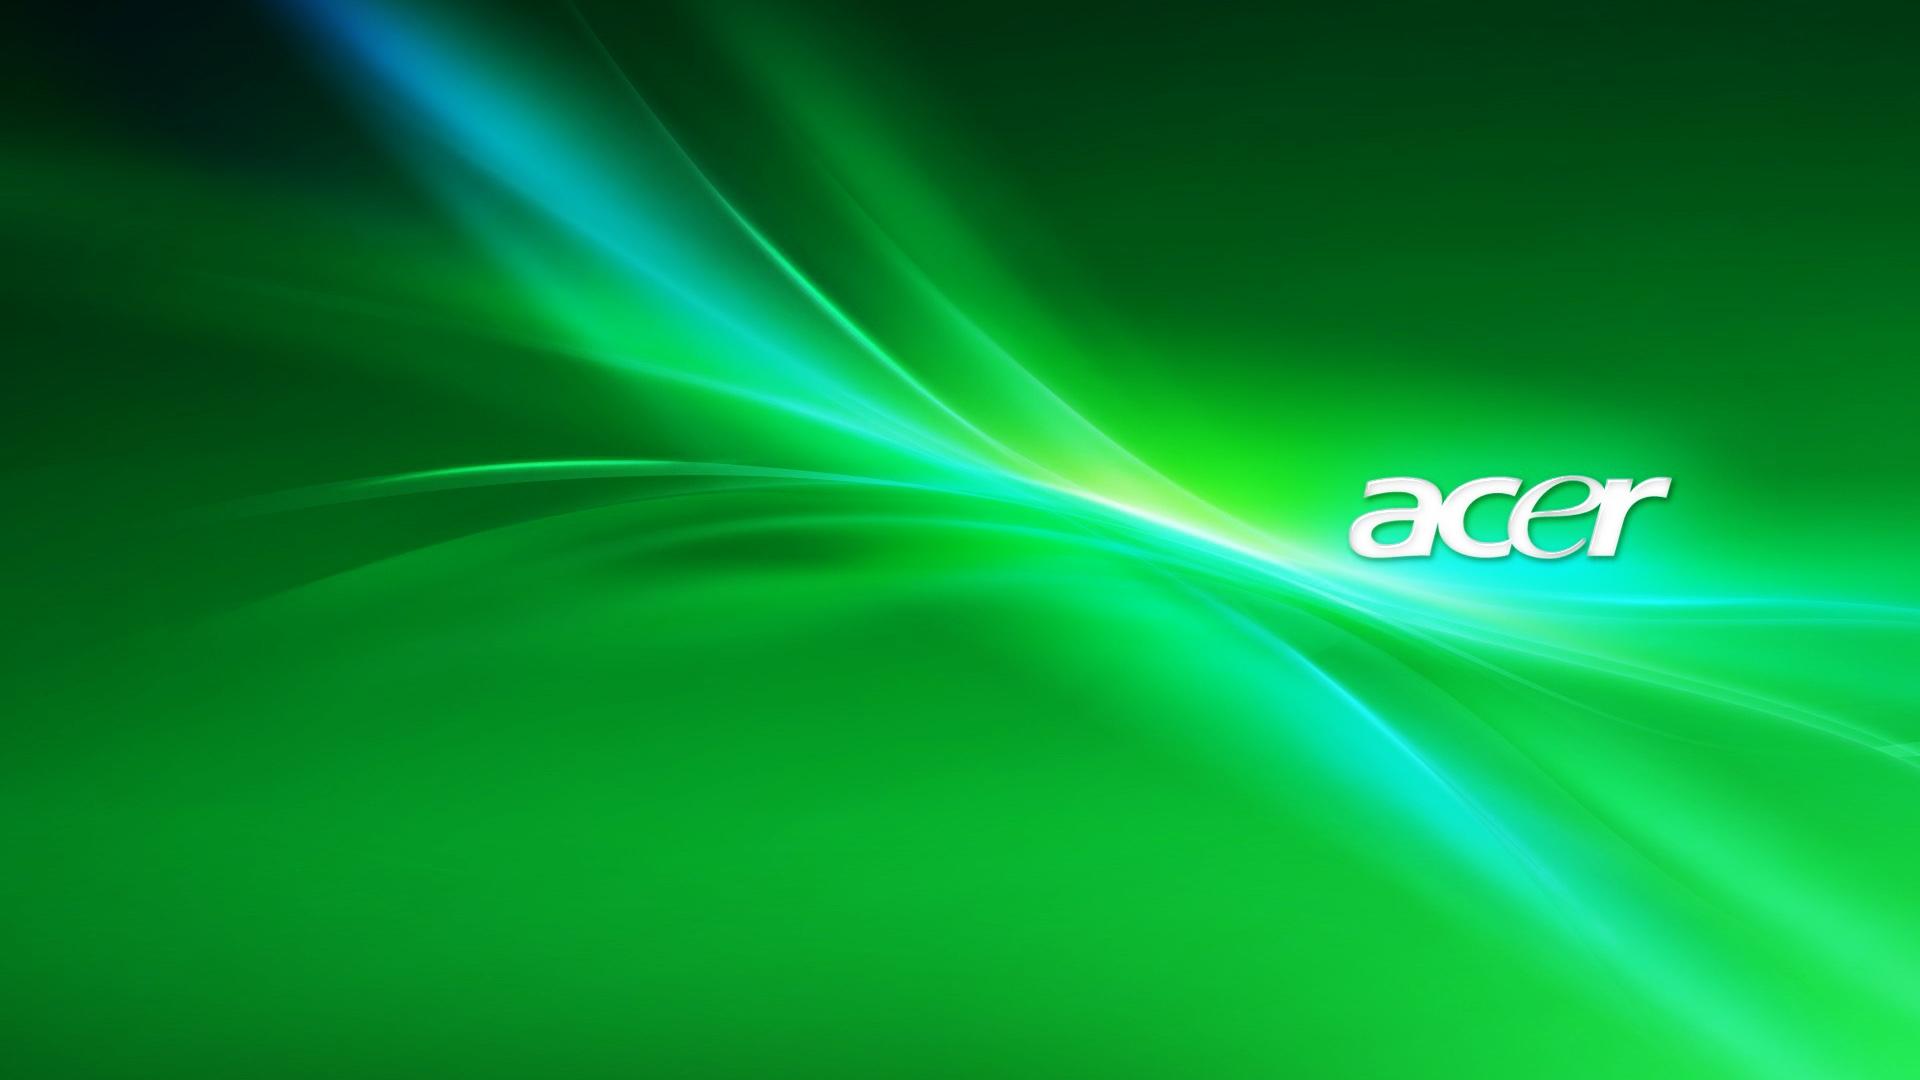 Acer Laptop Hd Wallpaper Download Humphrey 13 Images Acer Wallpapers Hd Wallpaper And